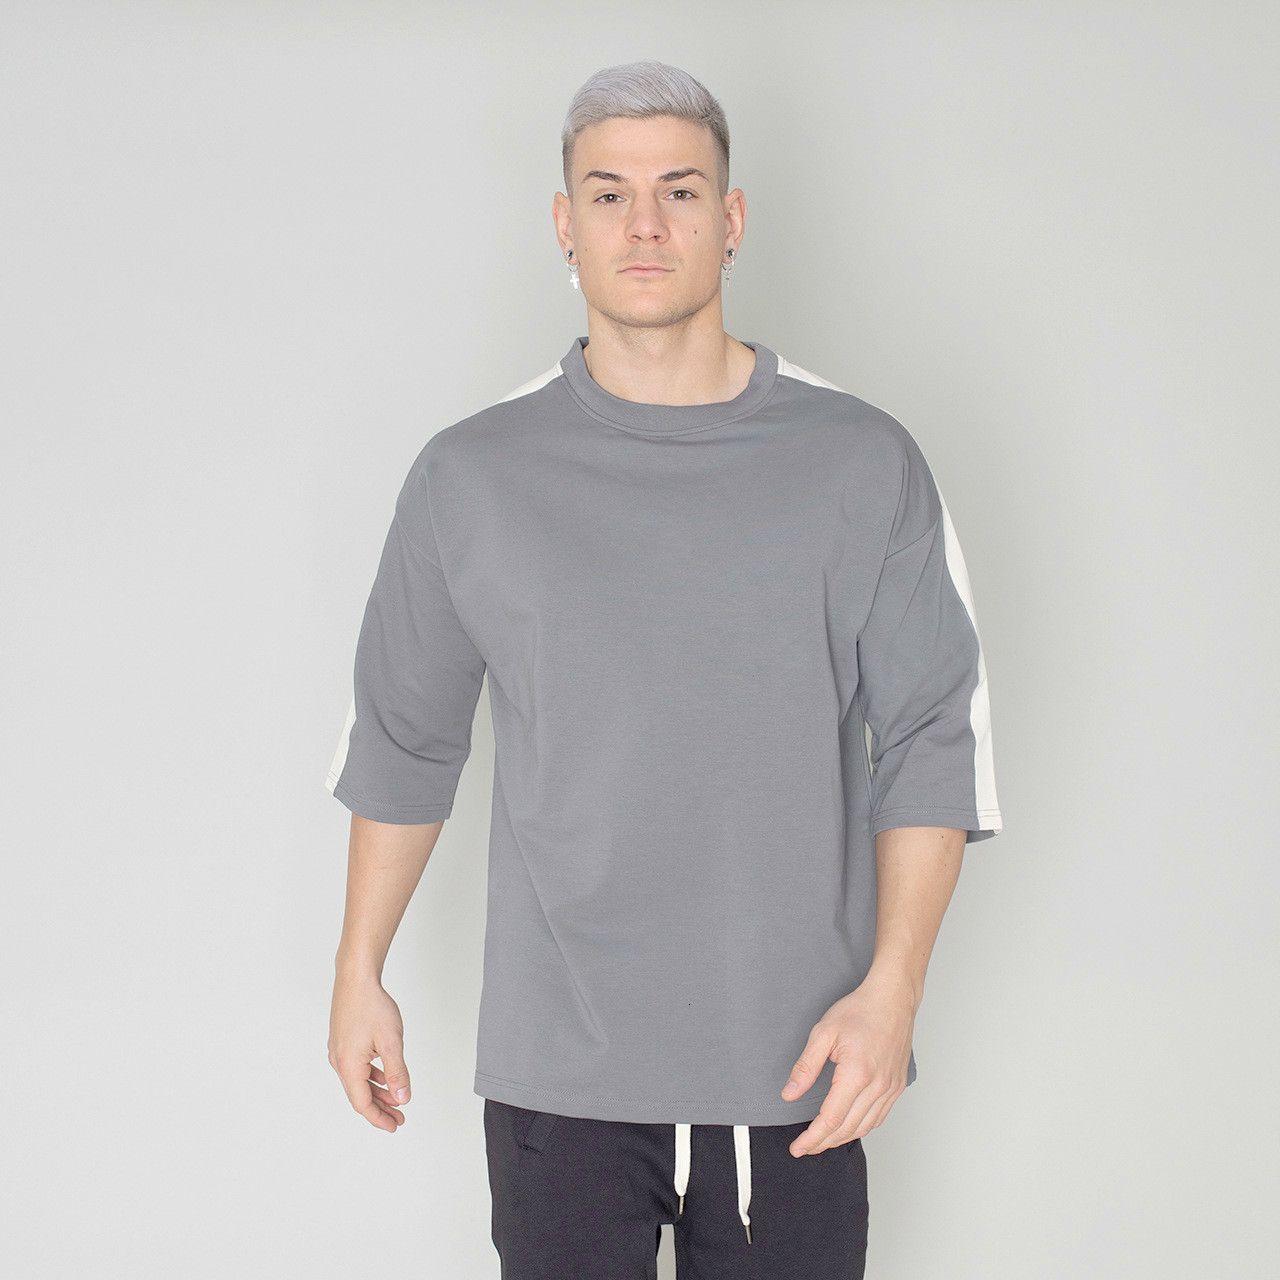 Мужчины Tshirt Половина рукава рубашки для мужчин вскользь Сыпучие Спорт Tshirt Harajuku Hip Hop Футболки Мужские рубашки GYM